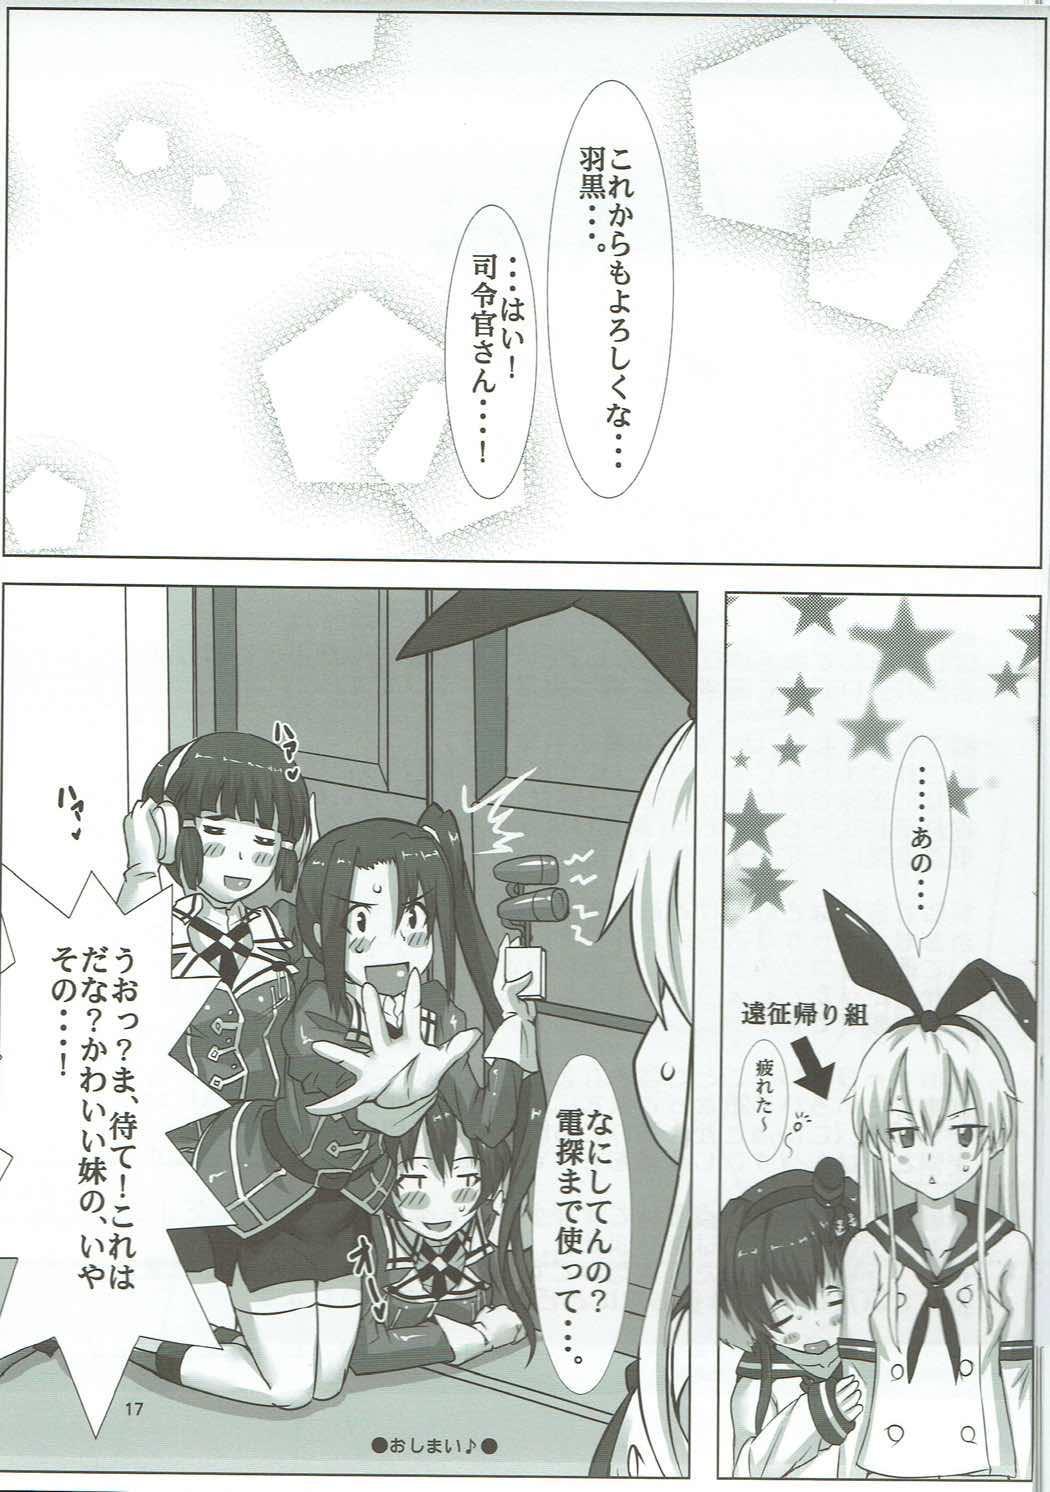 Haguro Ai no Kaishuu Max! 17